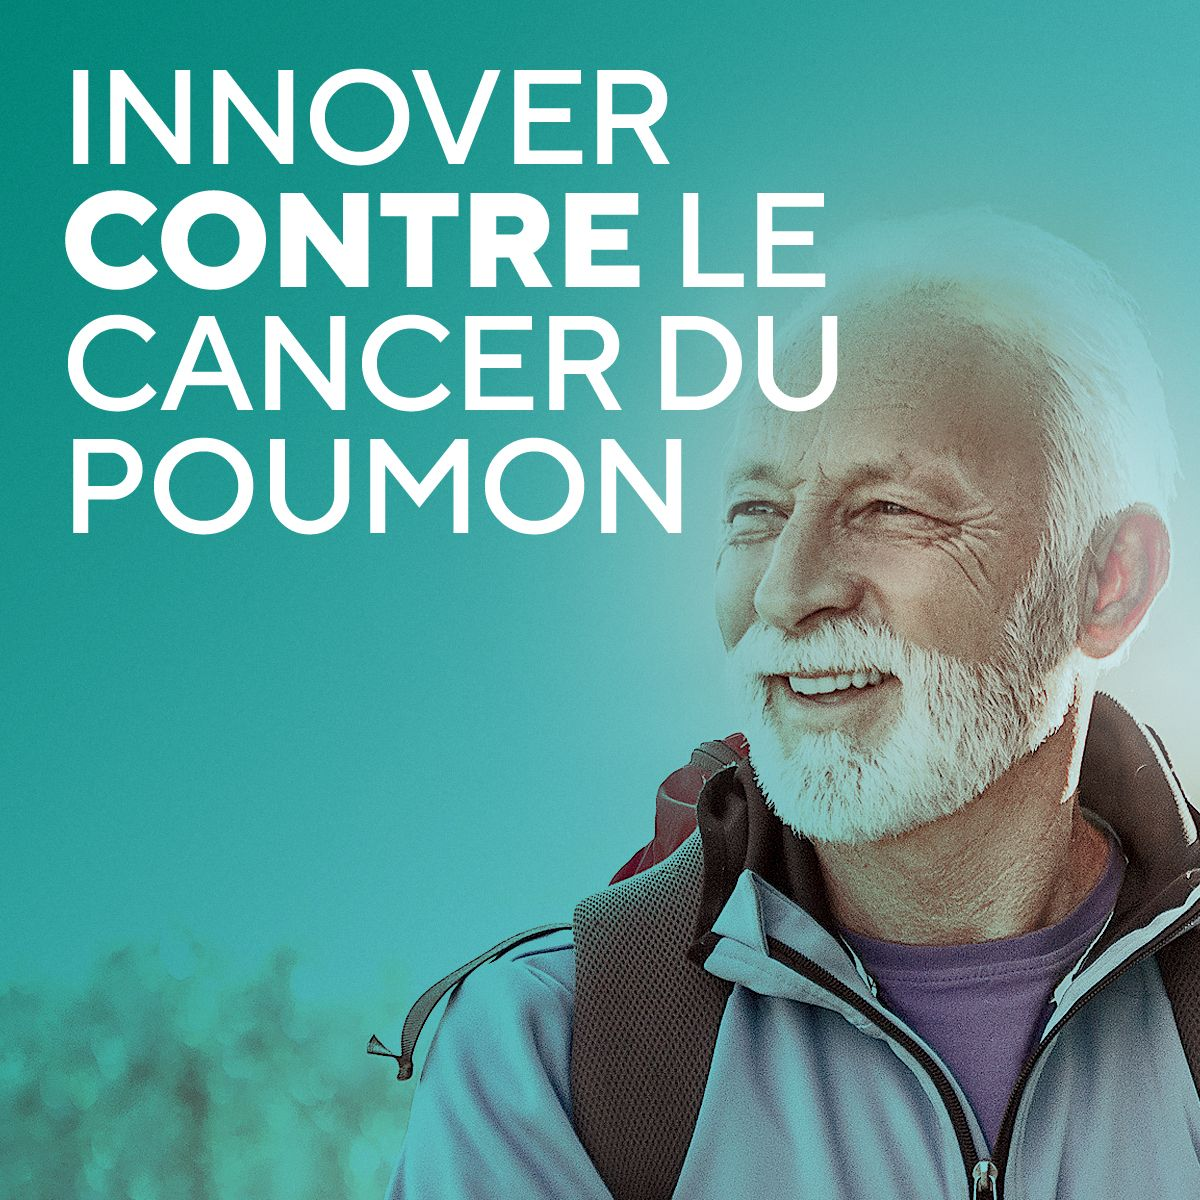 innover contre le cancer du poumon